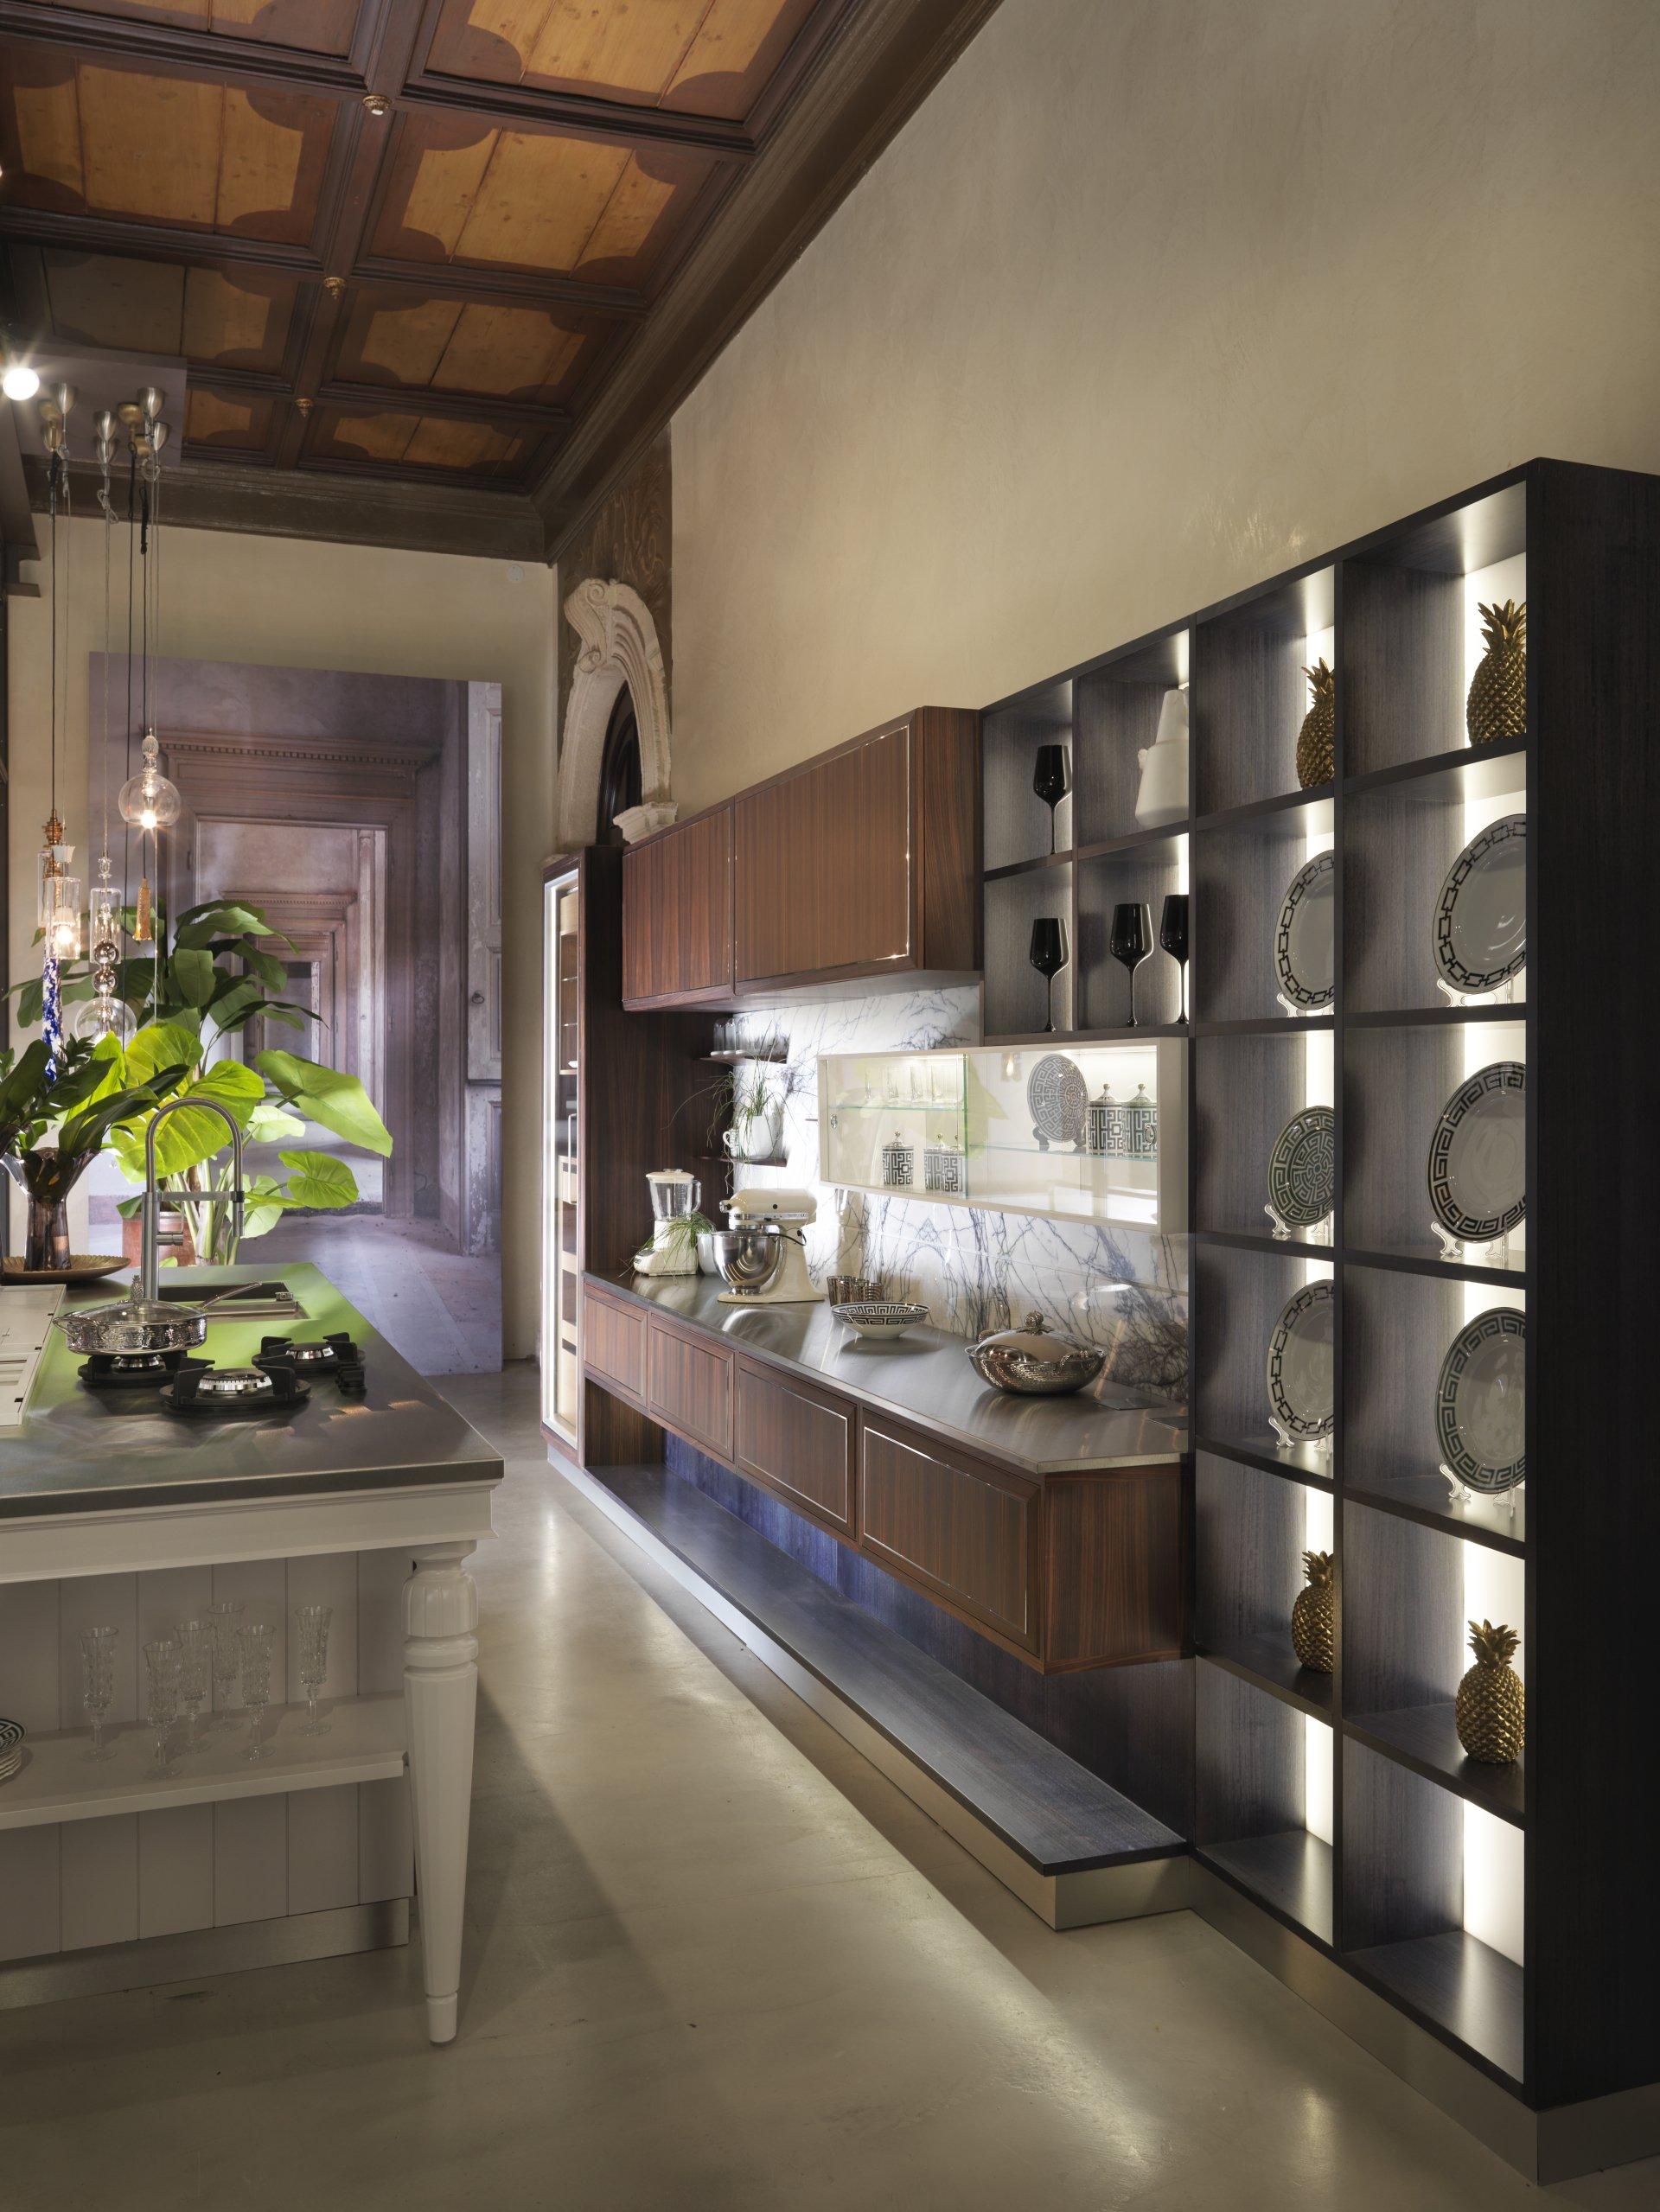 New martini mobili showroom in the heart of verona for Showroom mobili